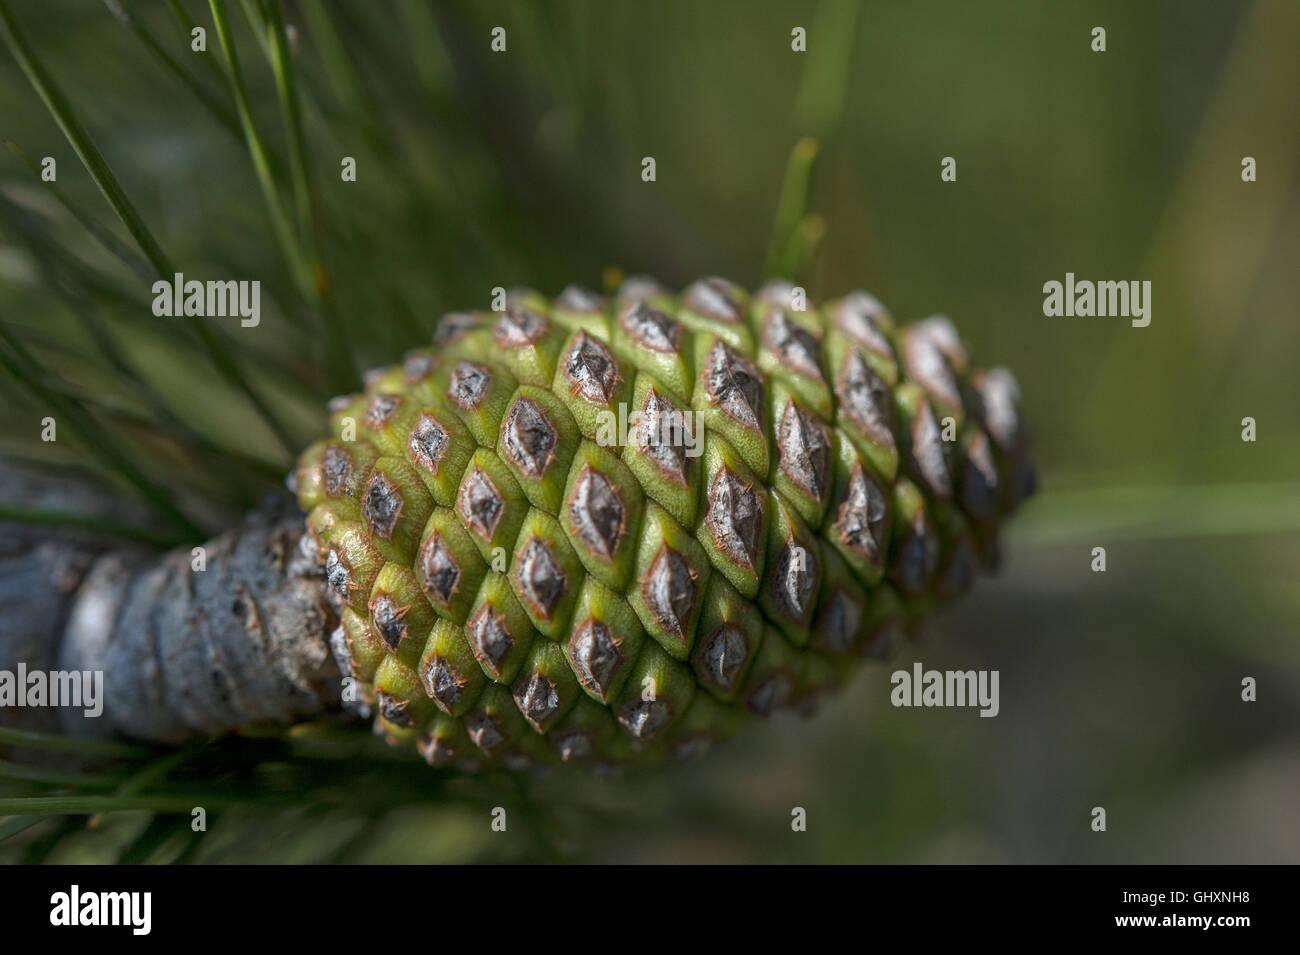 Pine cones of Creeping pine or dwarf mountainpine Pinus mugo, Pinaceae, Matera, Basilicata - Stock Image